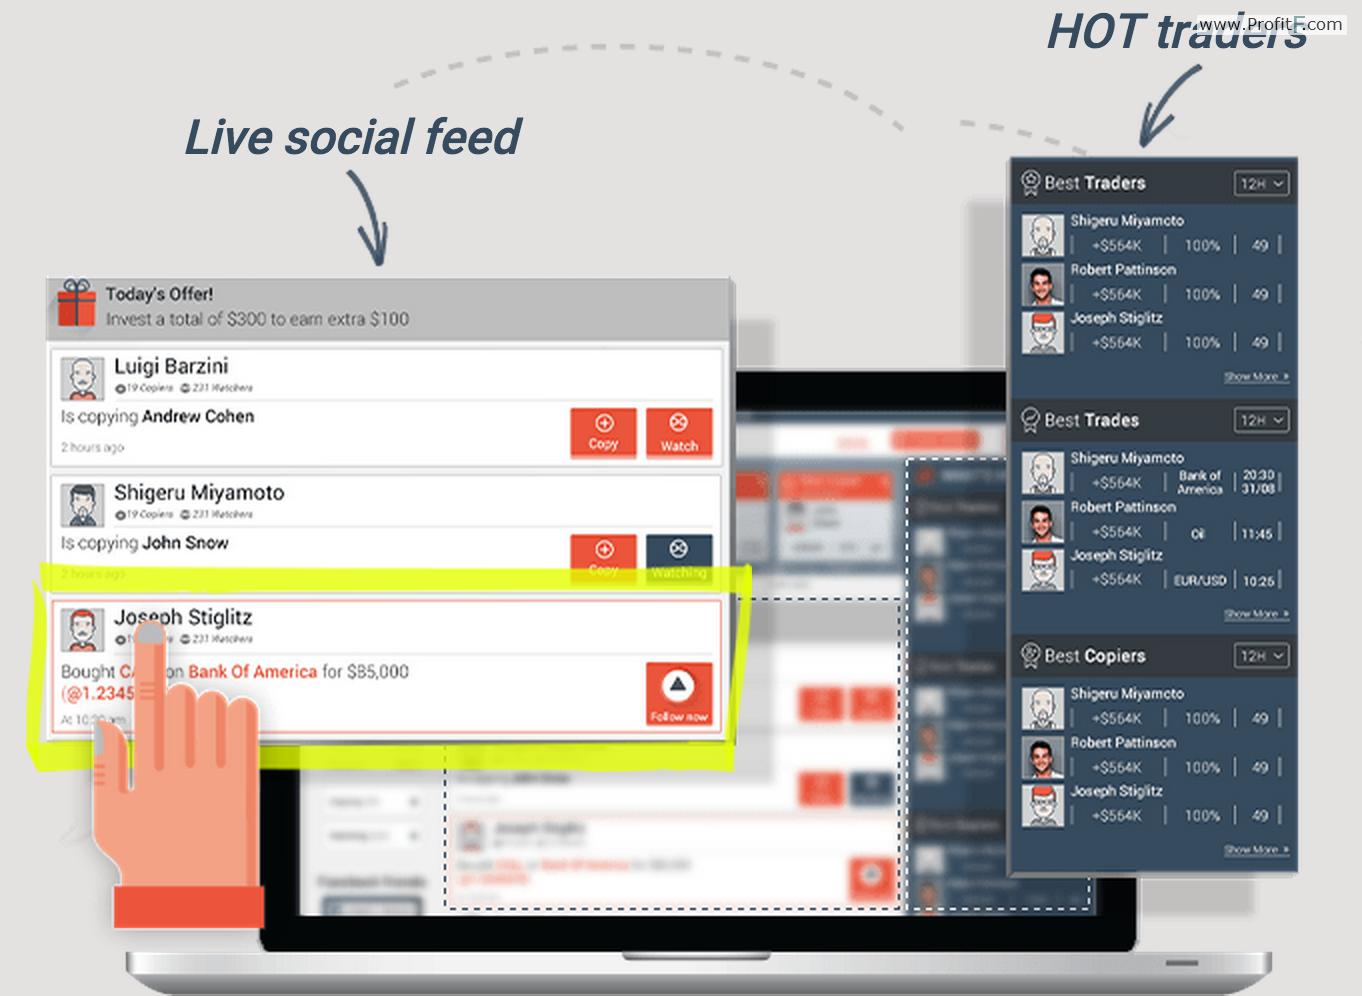 Binary options Social trading - http://www.profitf.com/articles/binary-options-education/binary-options-social-trading/